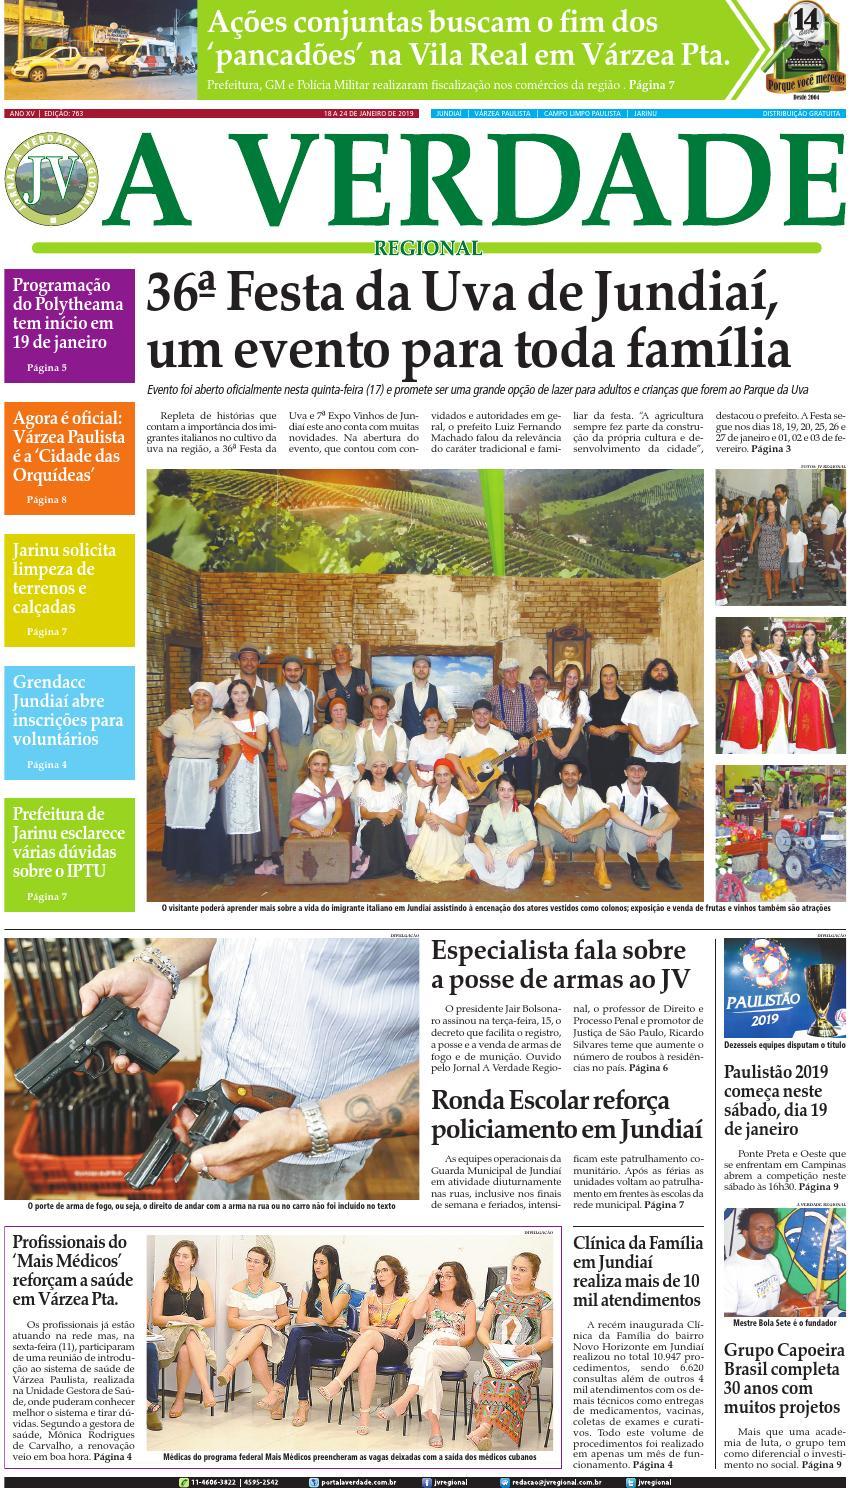 794f810051e JV Regional ® - Edição 763 by Jornal A Verdade Regional - issuu